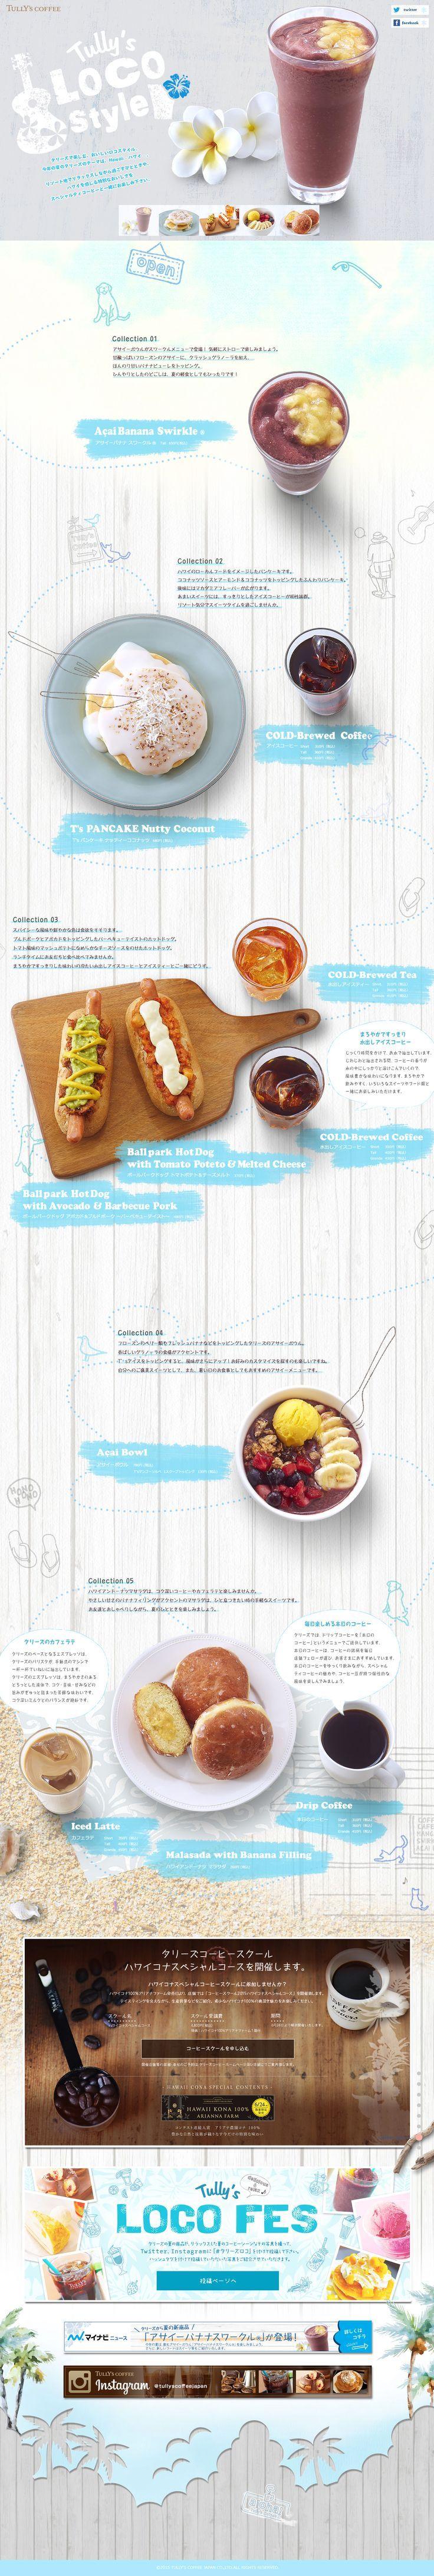 Beautiful Food Website Design Collection. = = = FREE CONSULTATION! Get similar web design service @